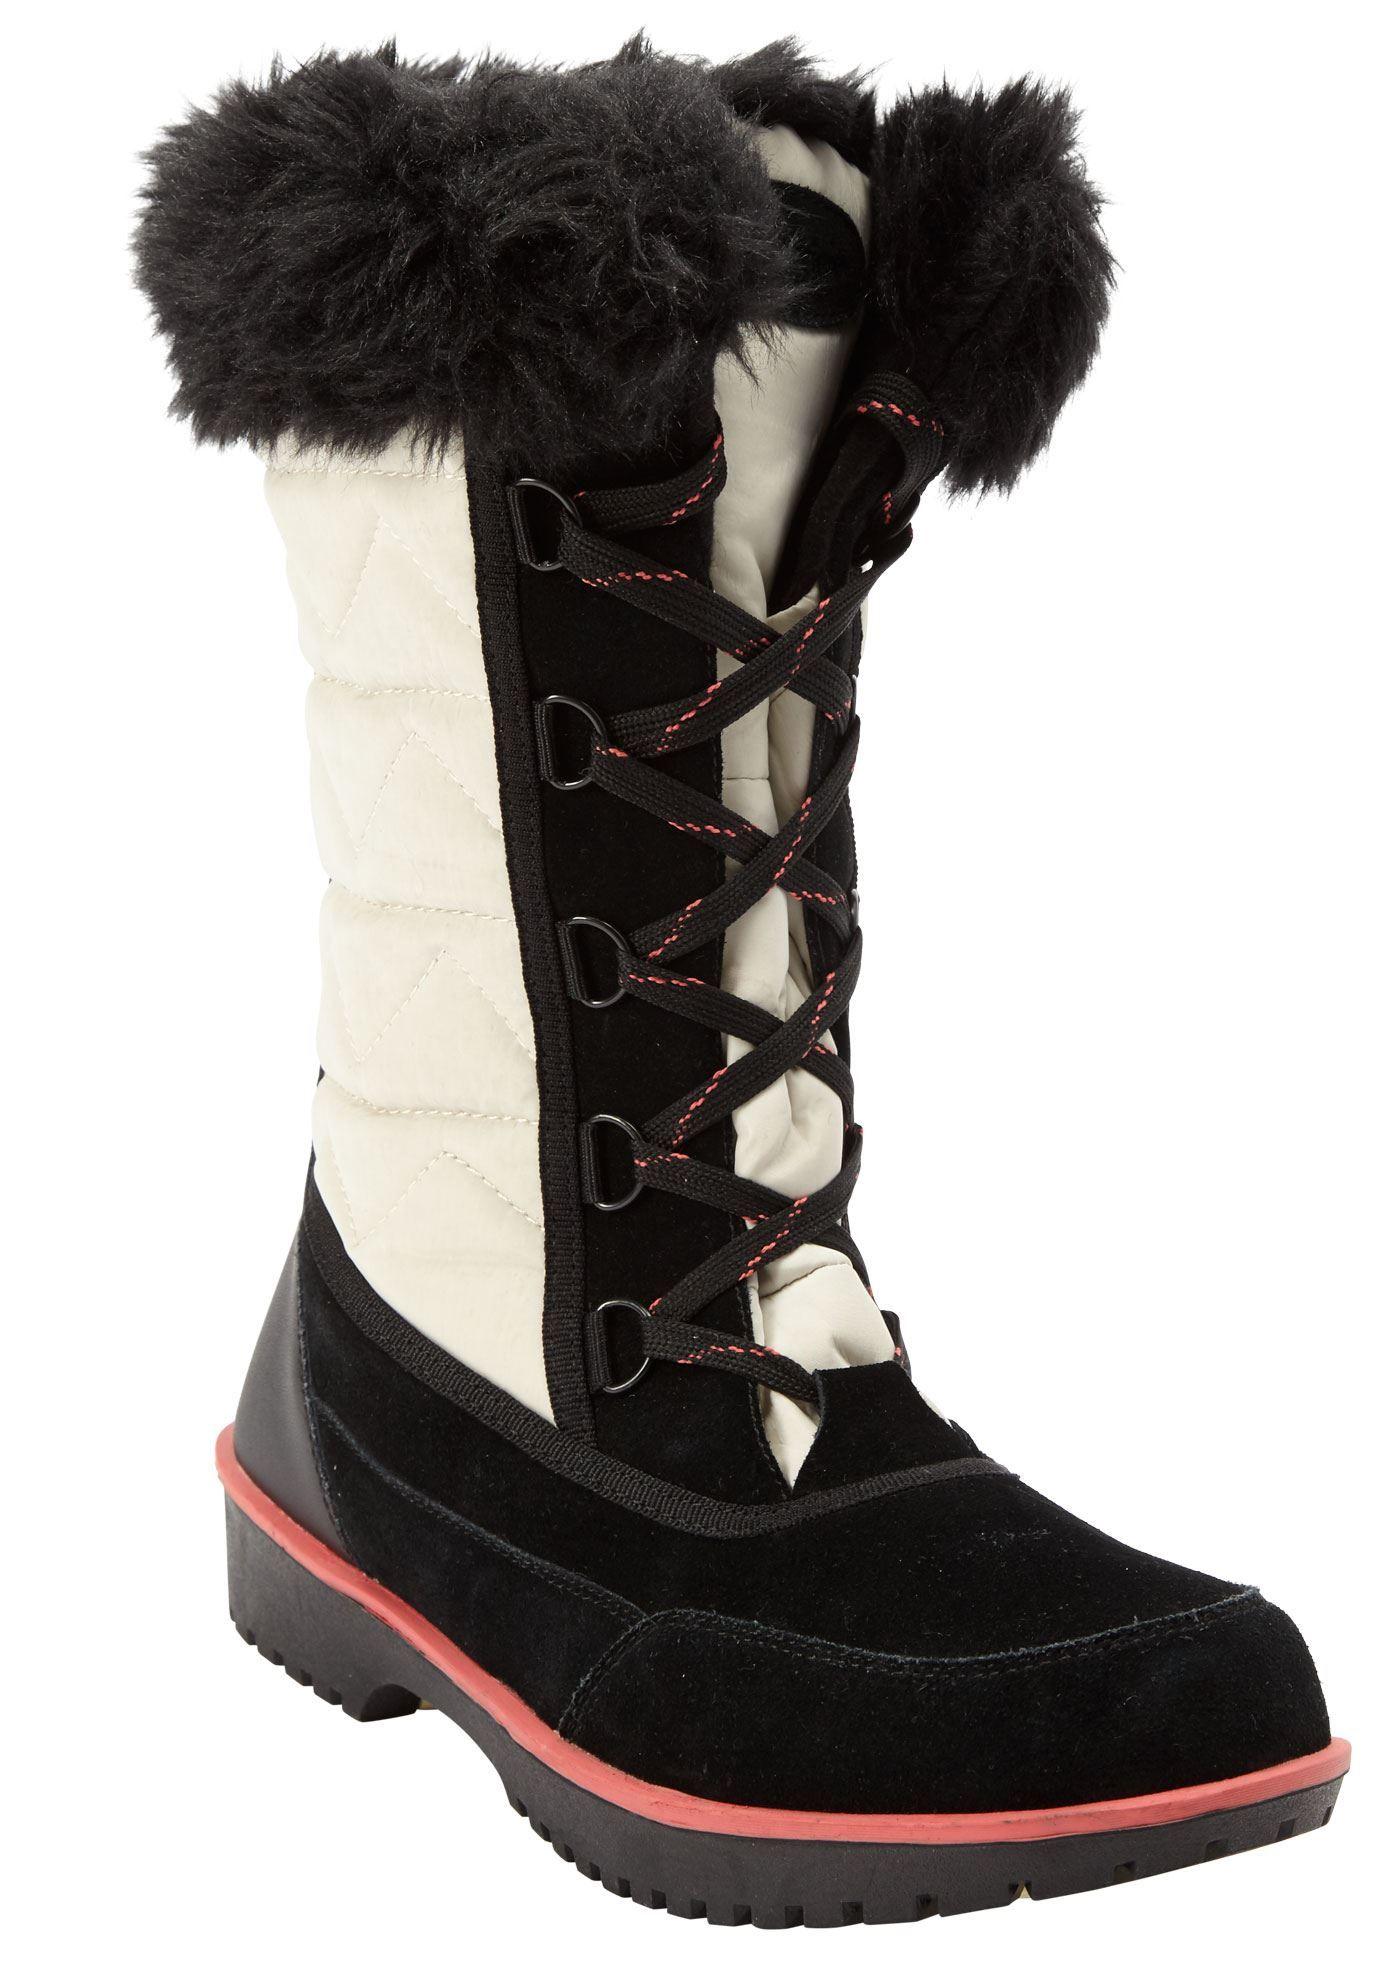 The Eileen Waterproof Wide Calf Boot by